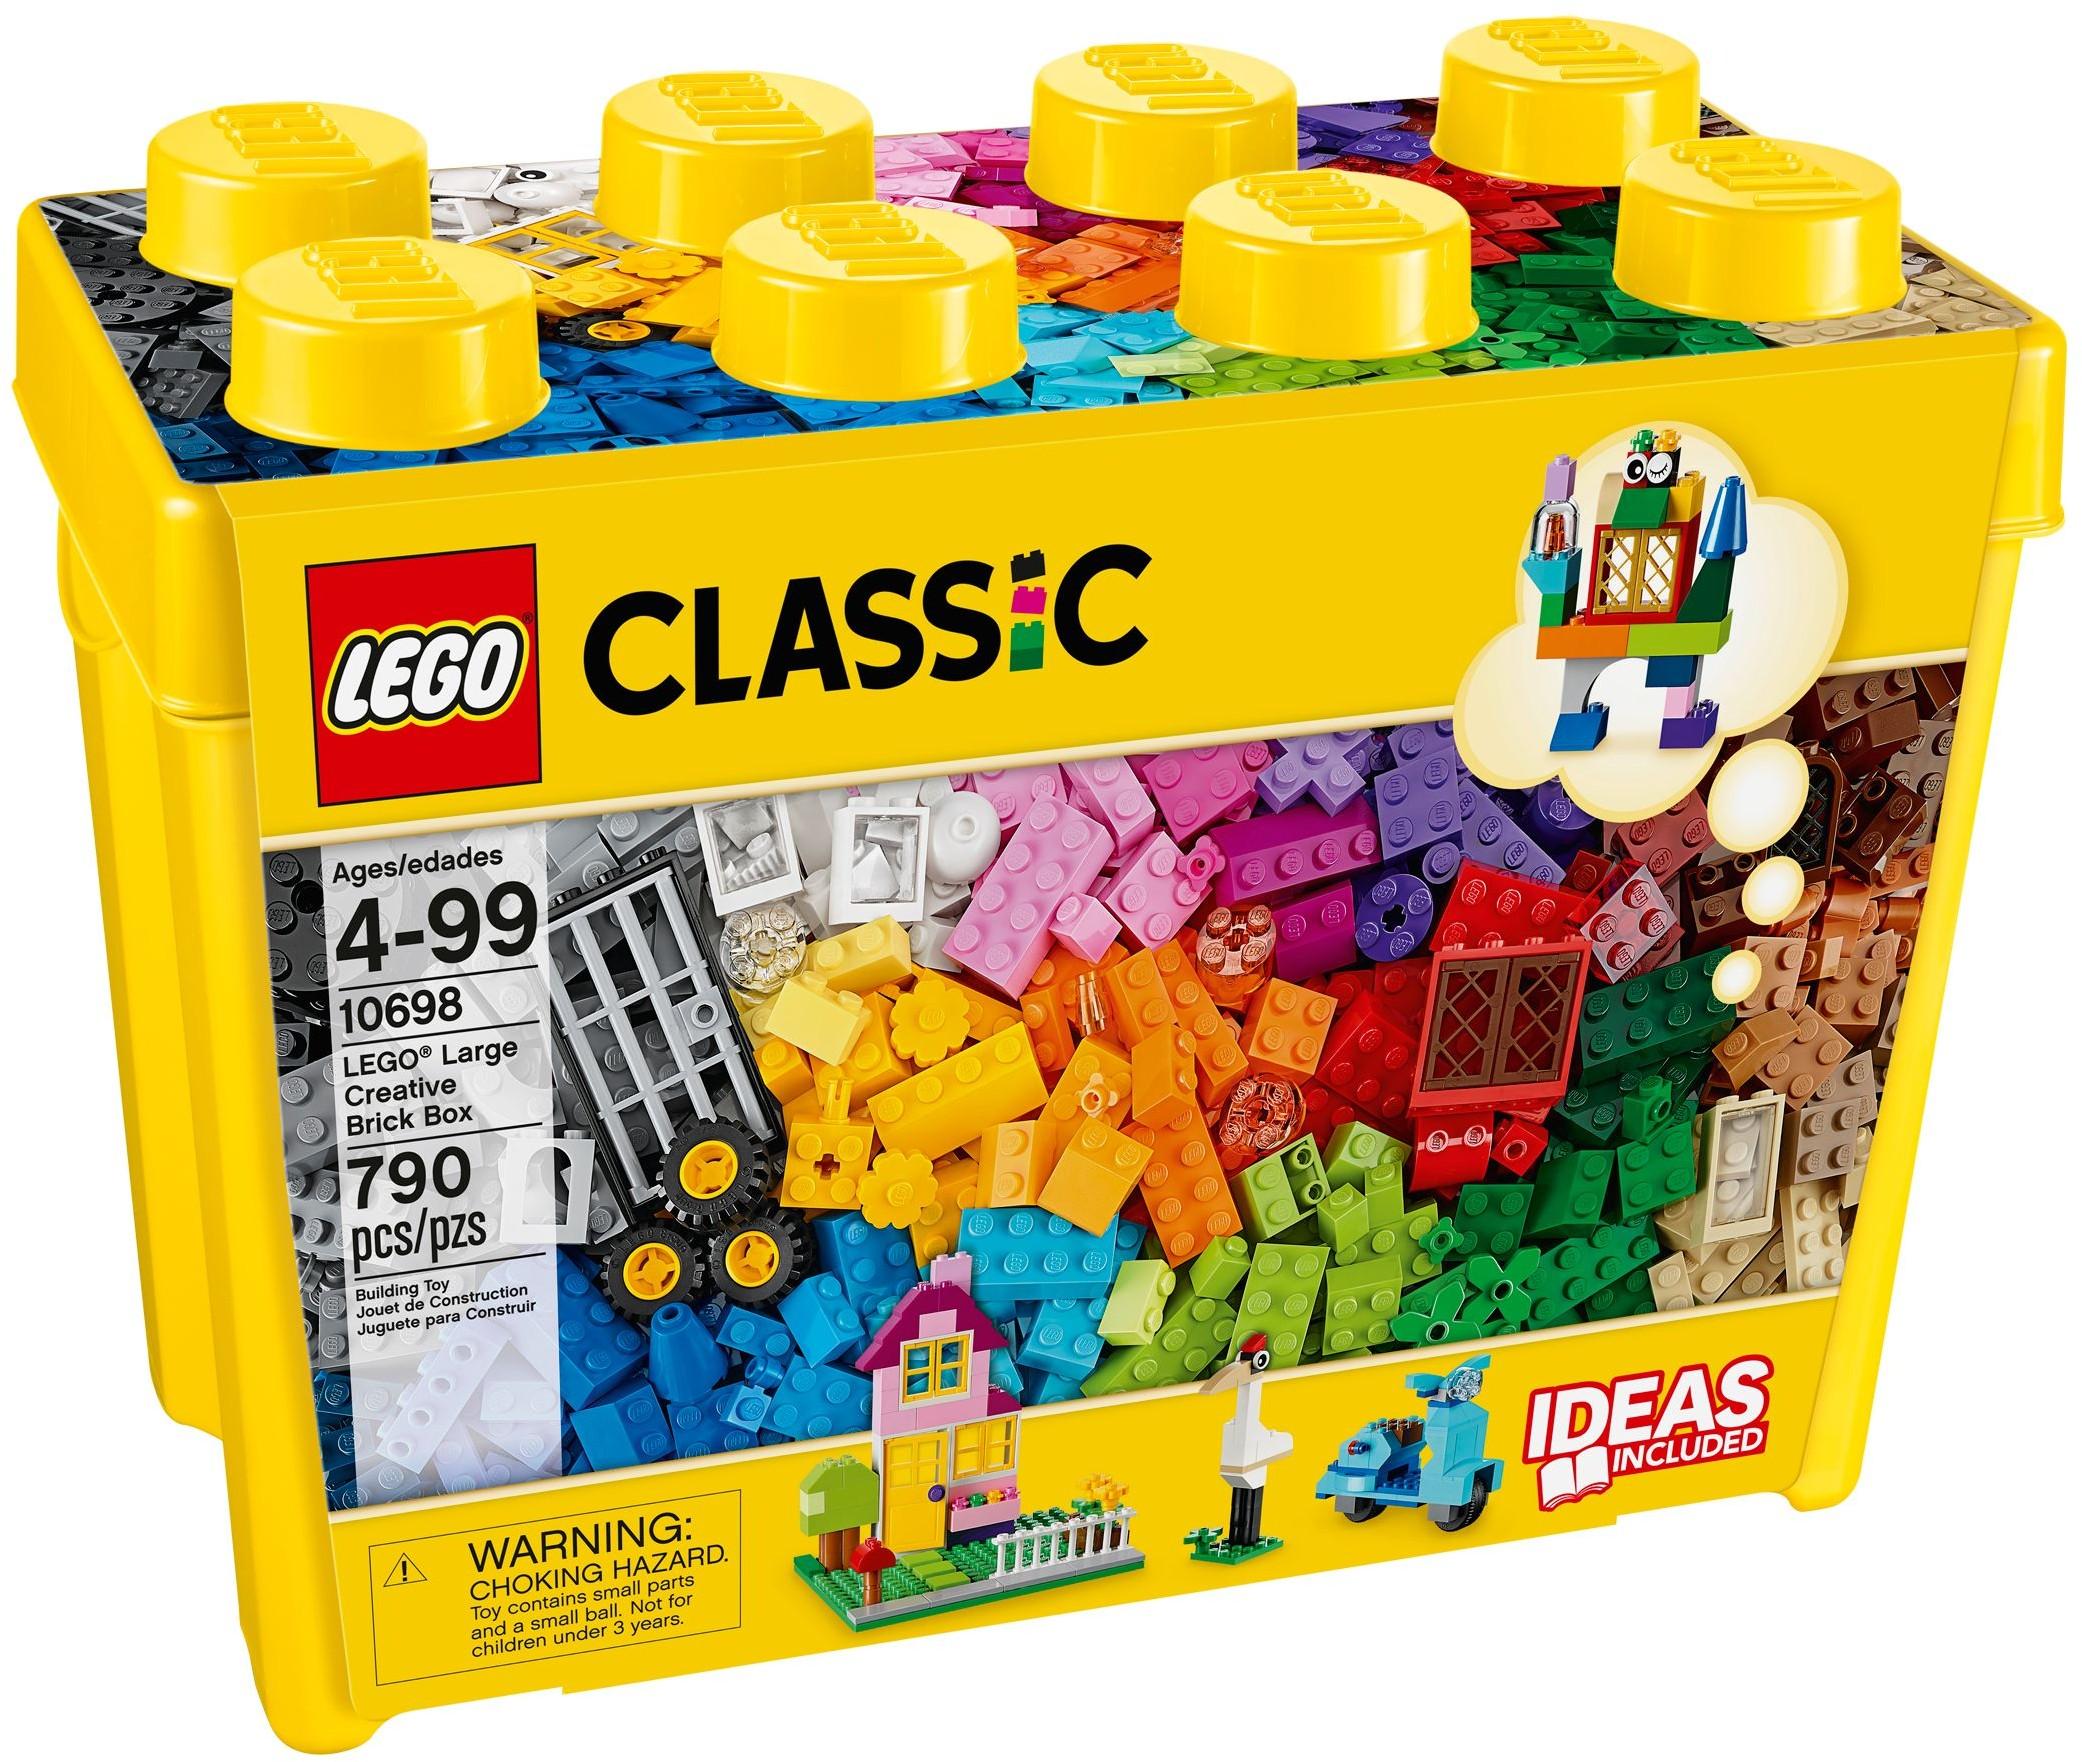 LEGO CLASSIC Kreatívne tehly Big Box 10698